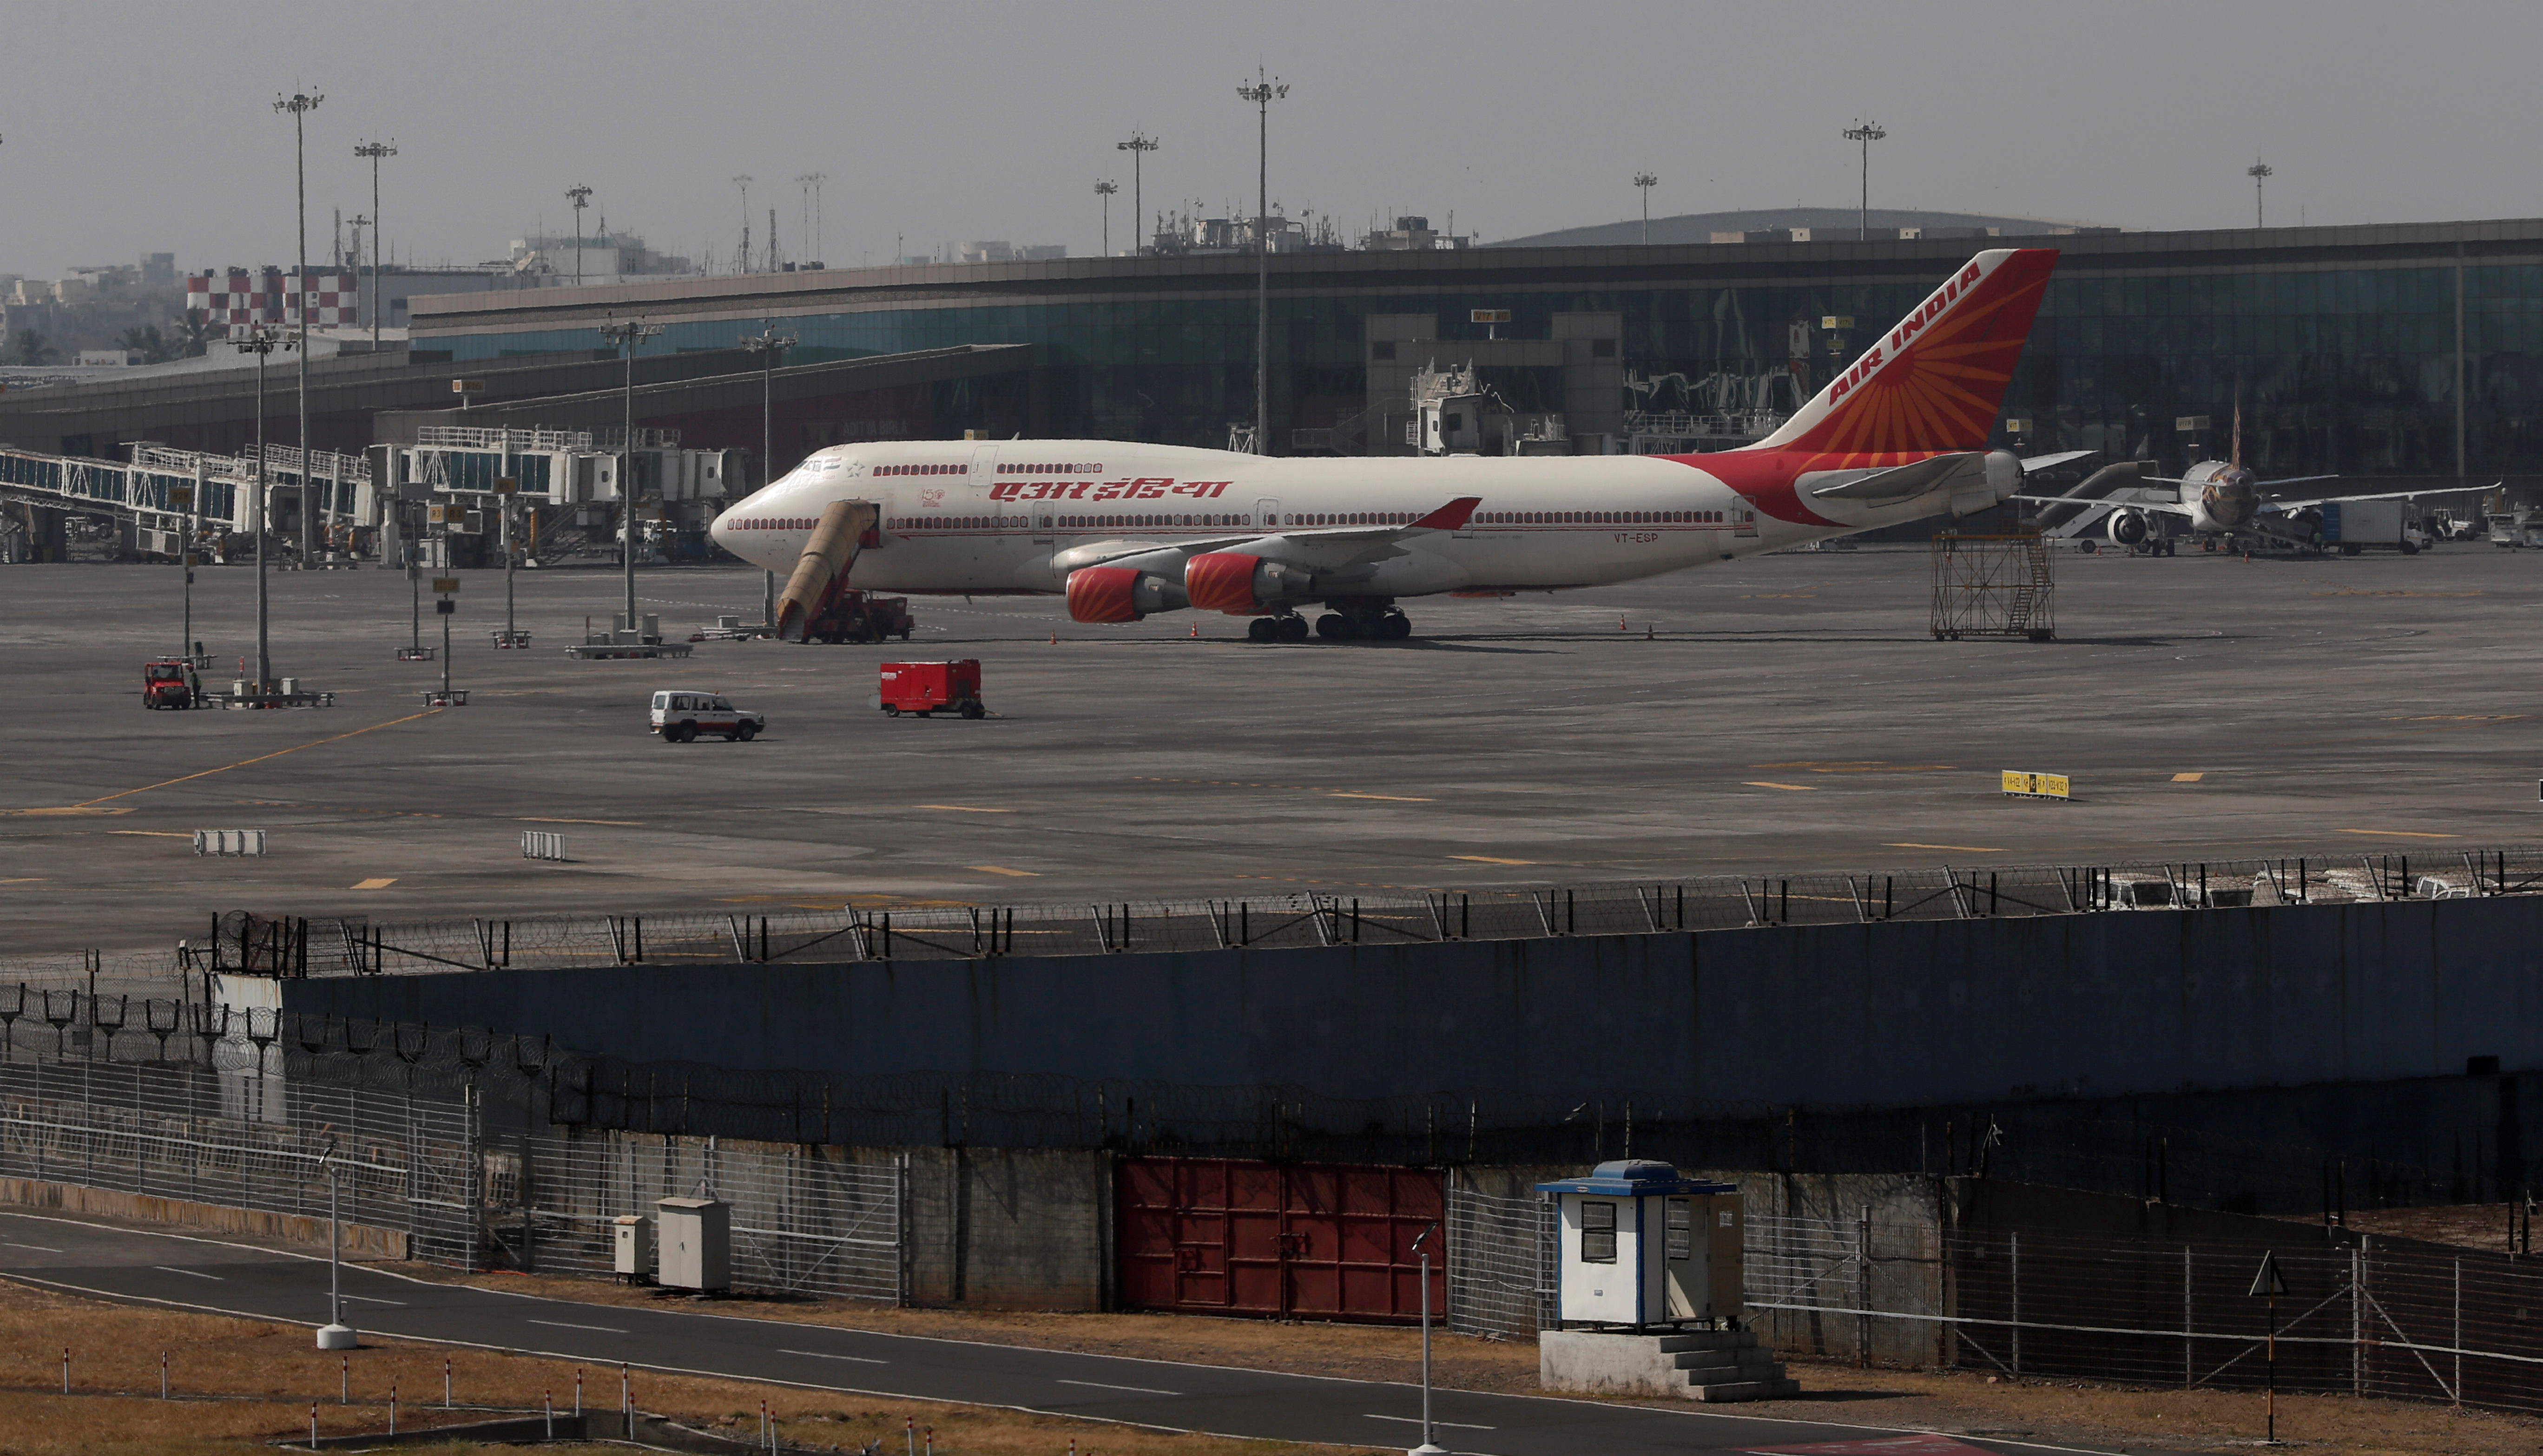 An Air India Boeing 747-400 aircraft is seen parked on the tarmac at Chhatrapati Shivaji Maharaj International Airport in Mumbai, India, January 30, 2020. REUTERS/Francis Mascarenhas - RC2BQE94CGUH